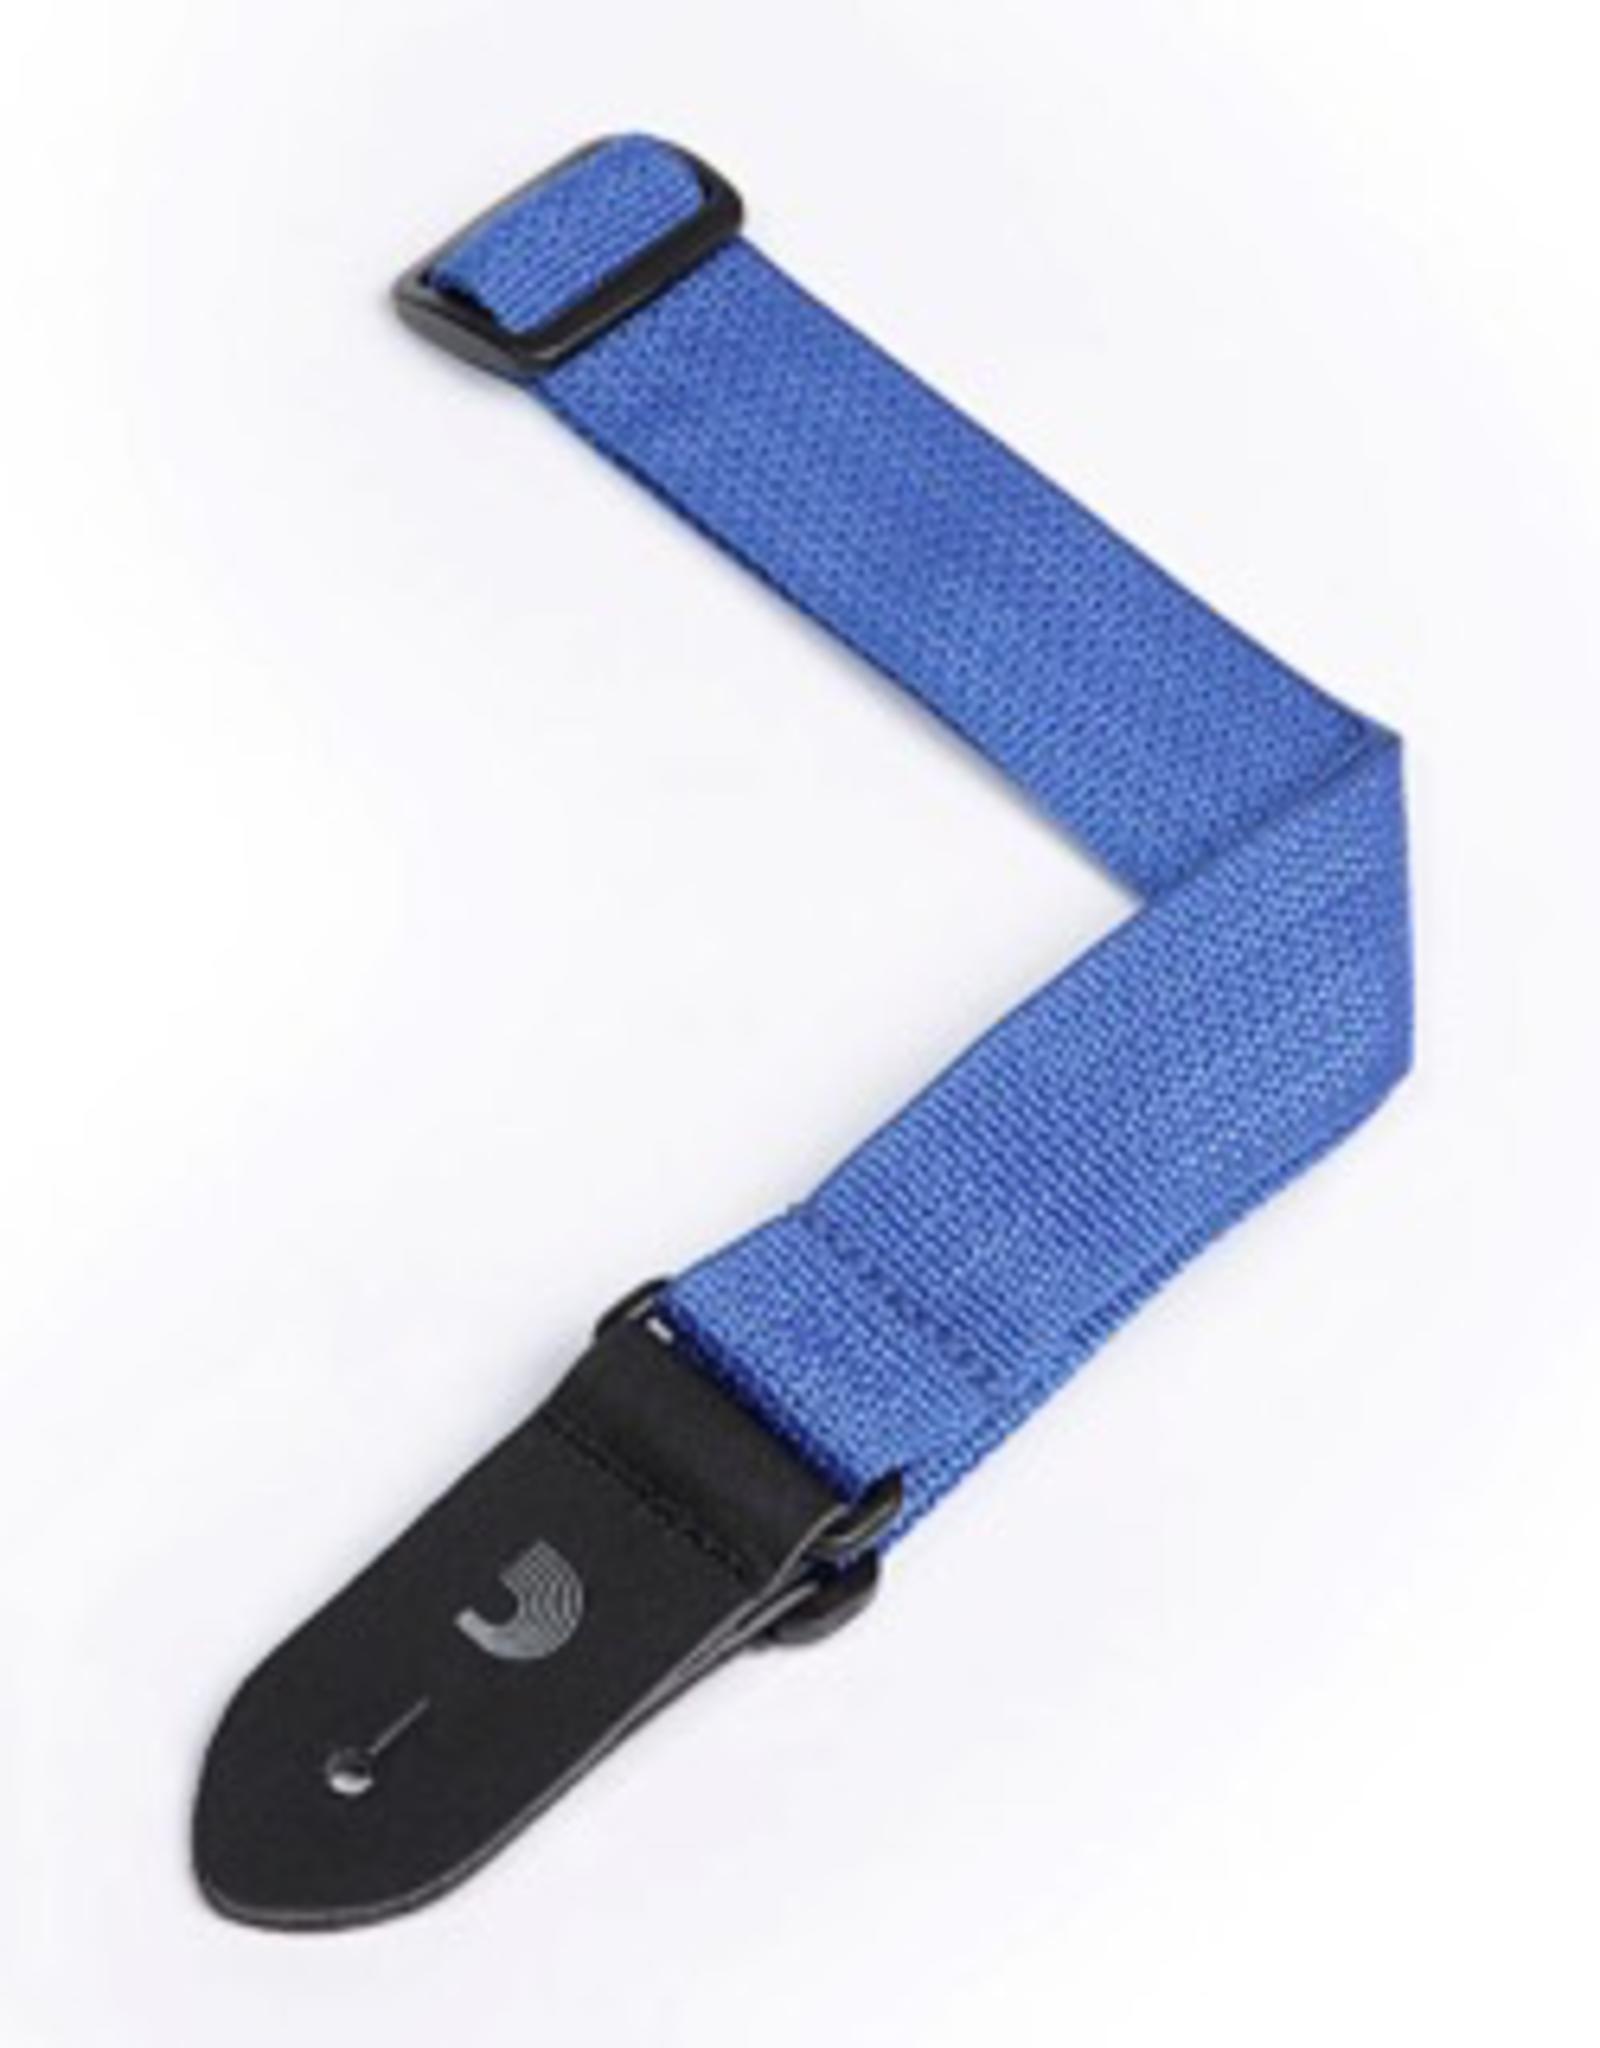 D'Addario D'Addario Polypropylene Ukulele Strap, Blue